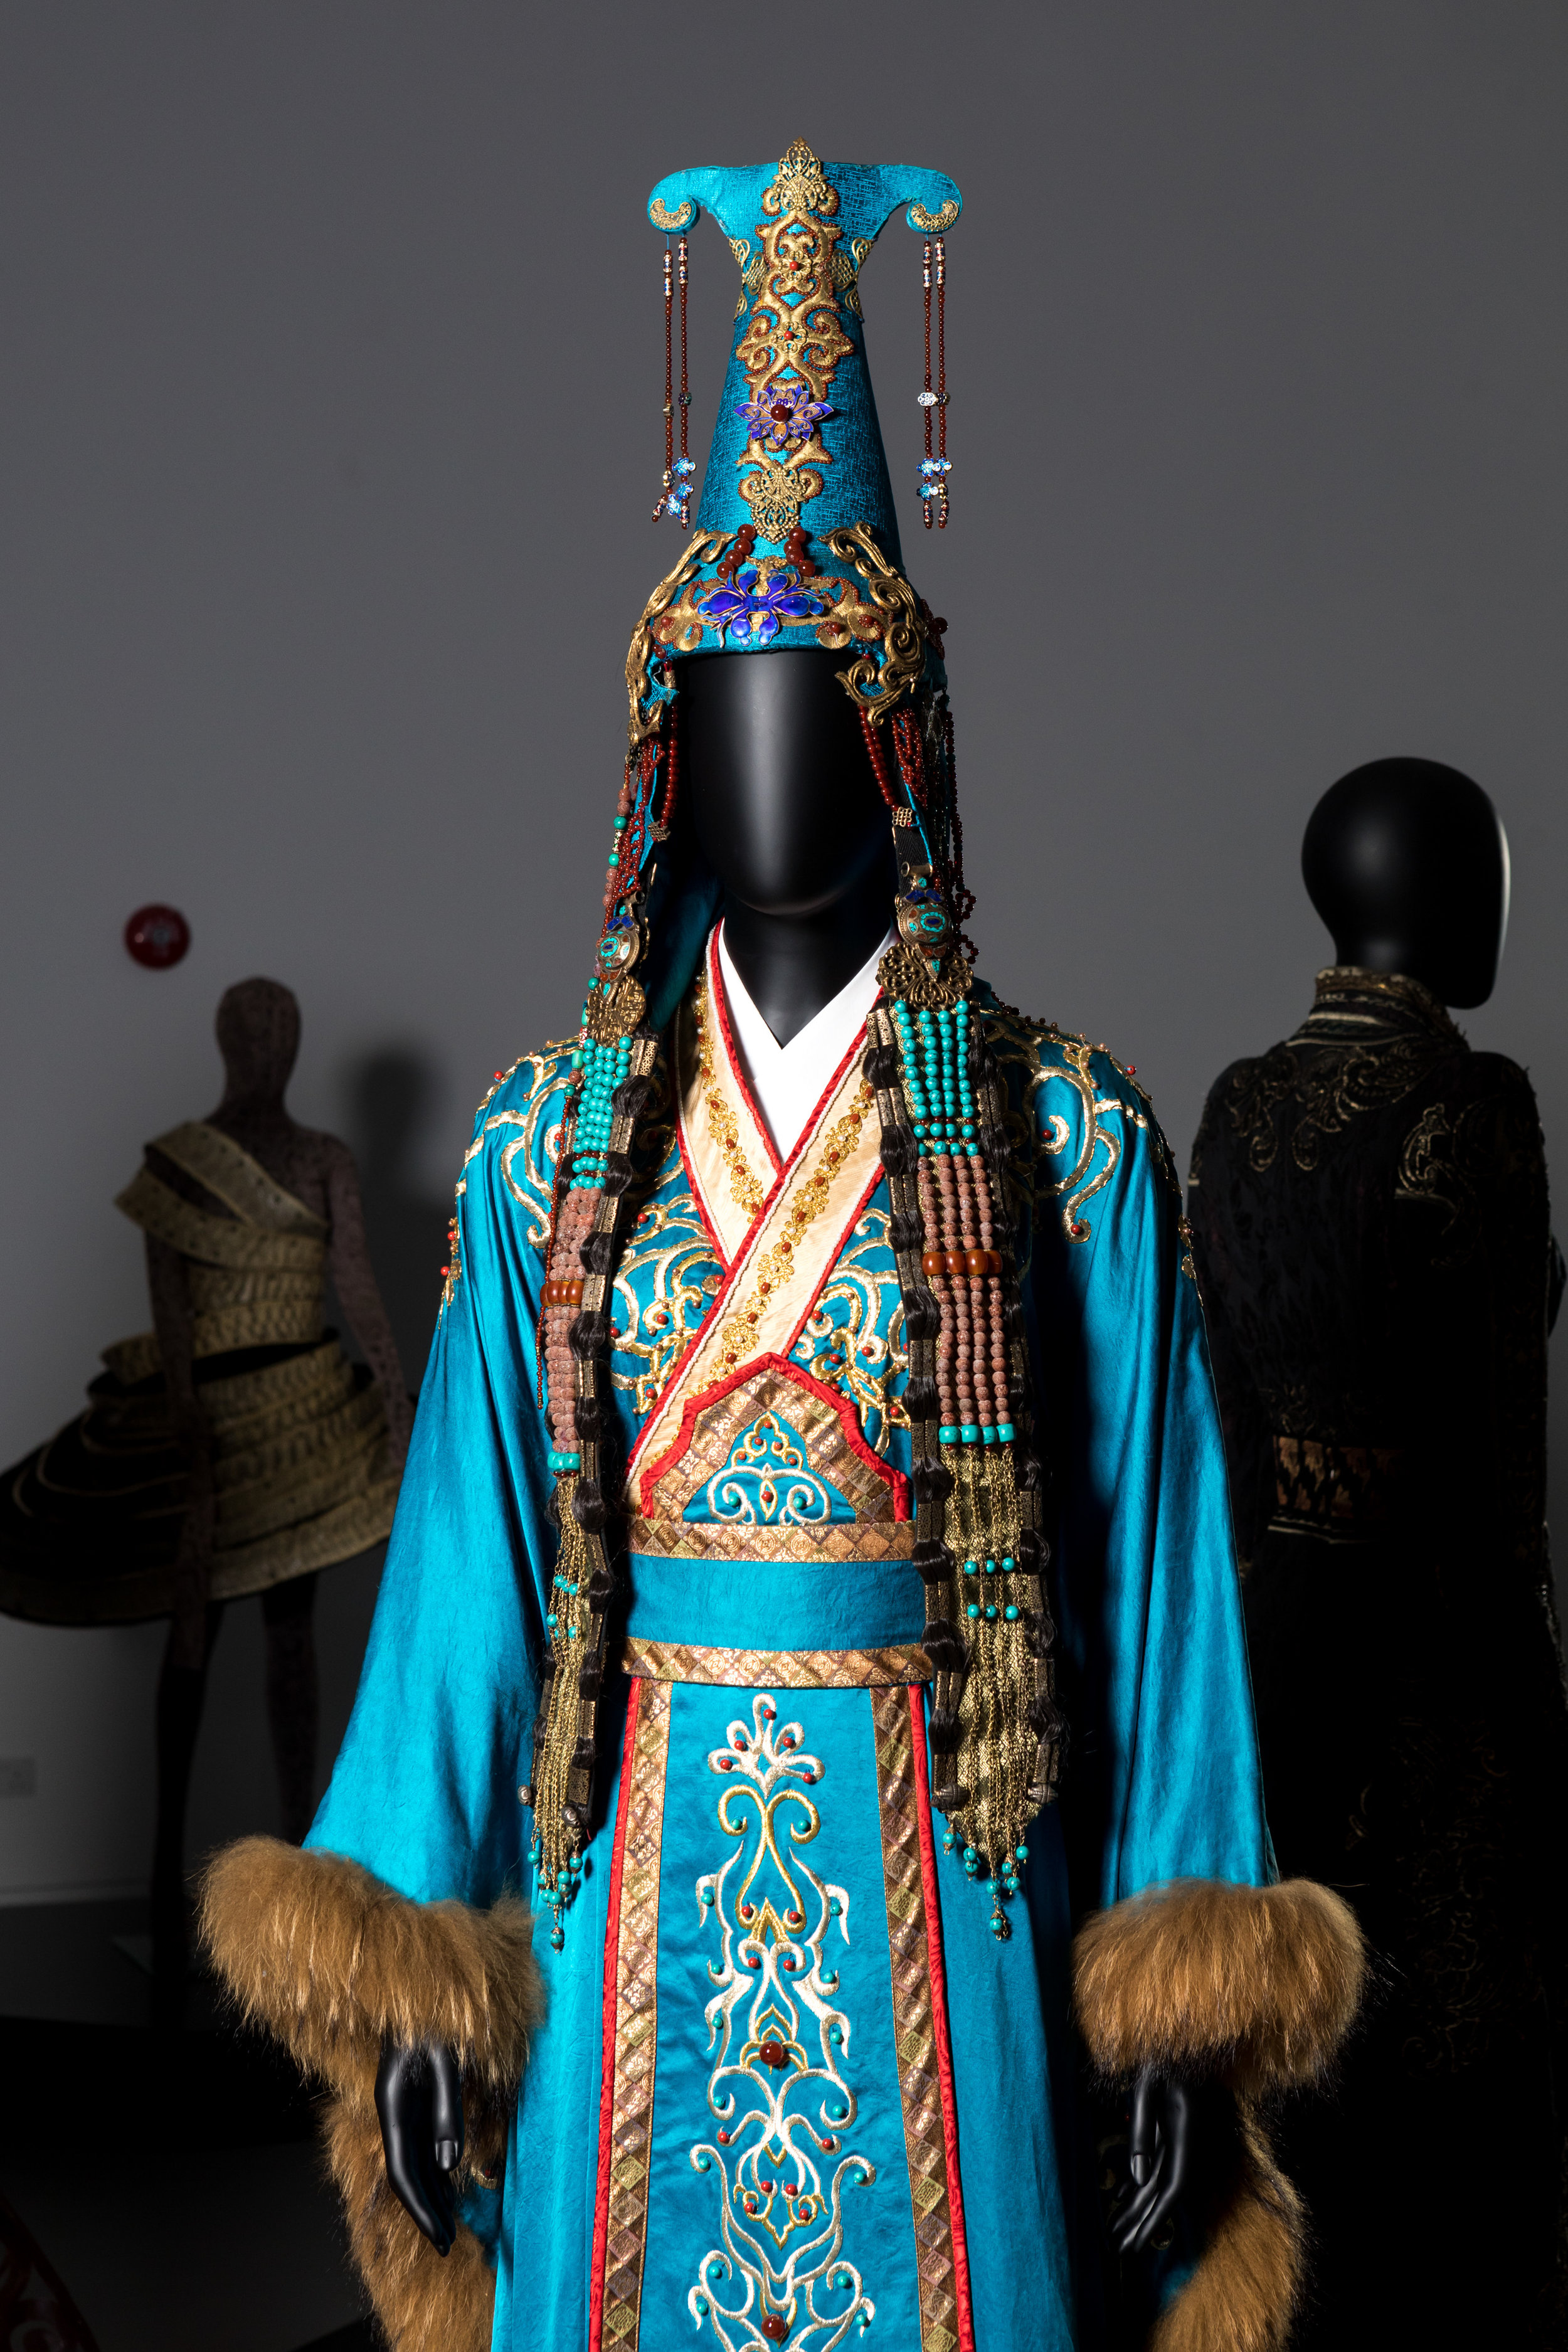 HKDI_TimYip-Blue_Costume8.jpg